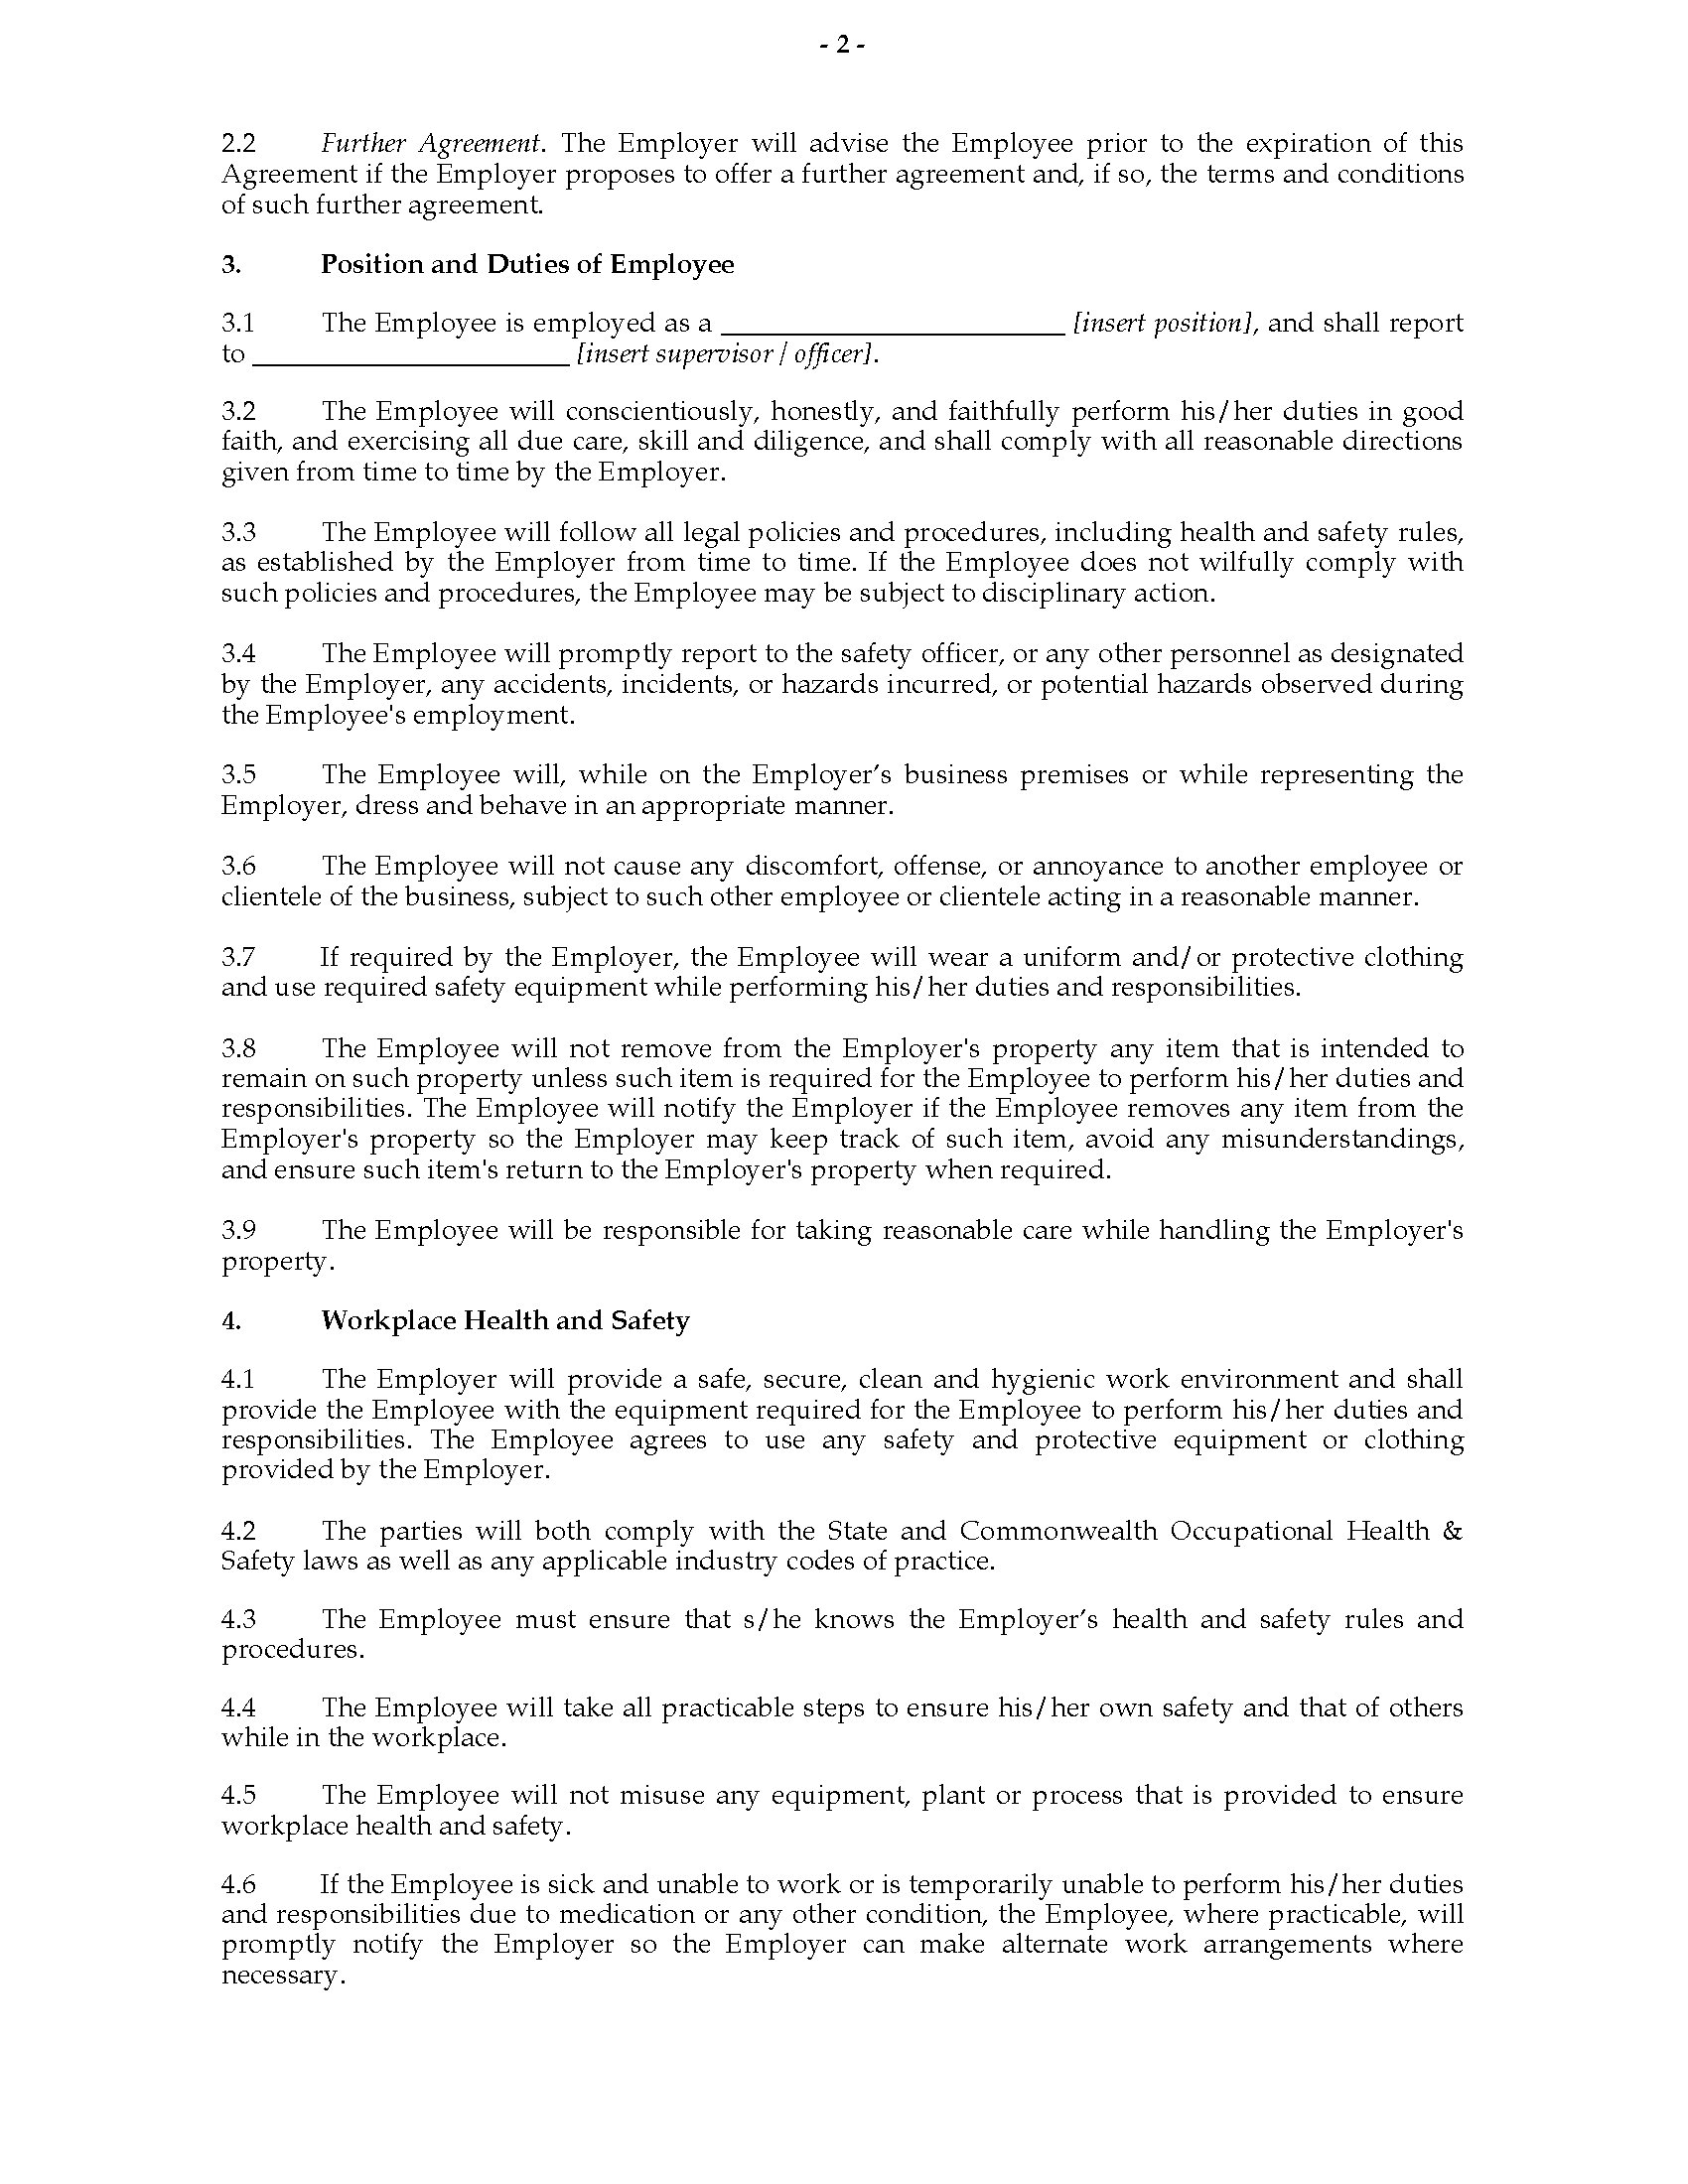 australia workplace agreement template